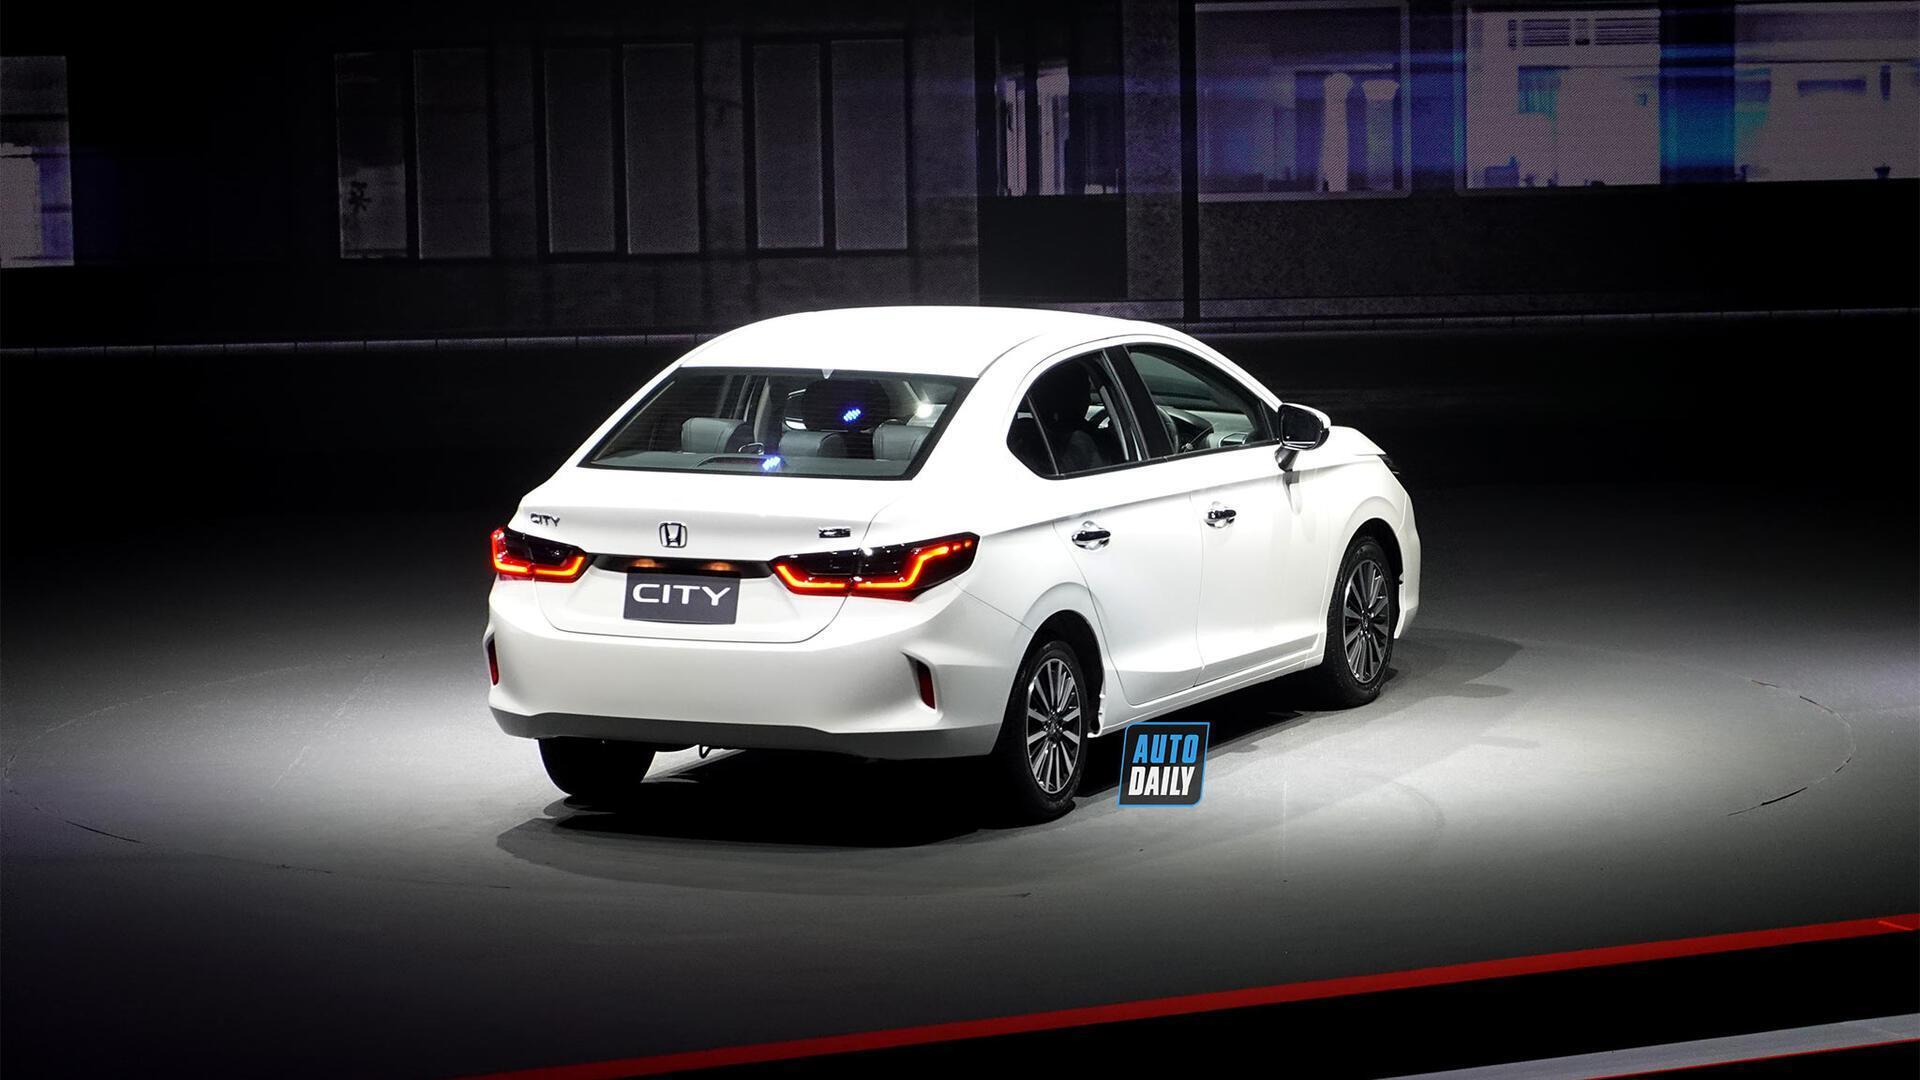 honda-city-2020-autodaily-05.jpg